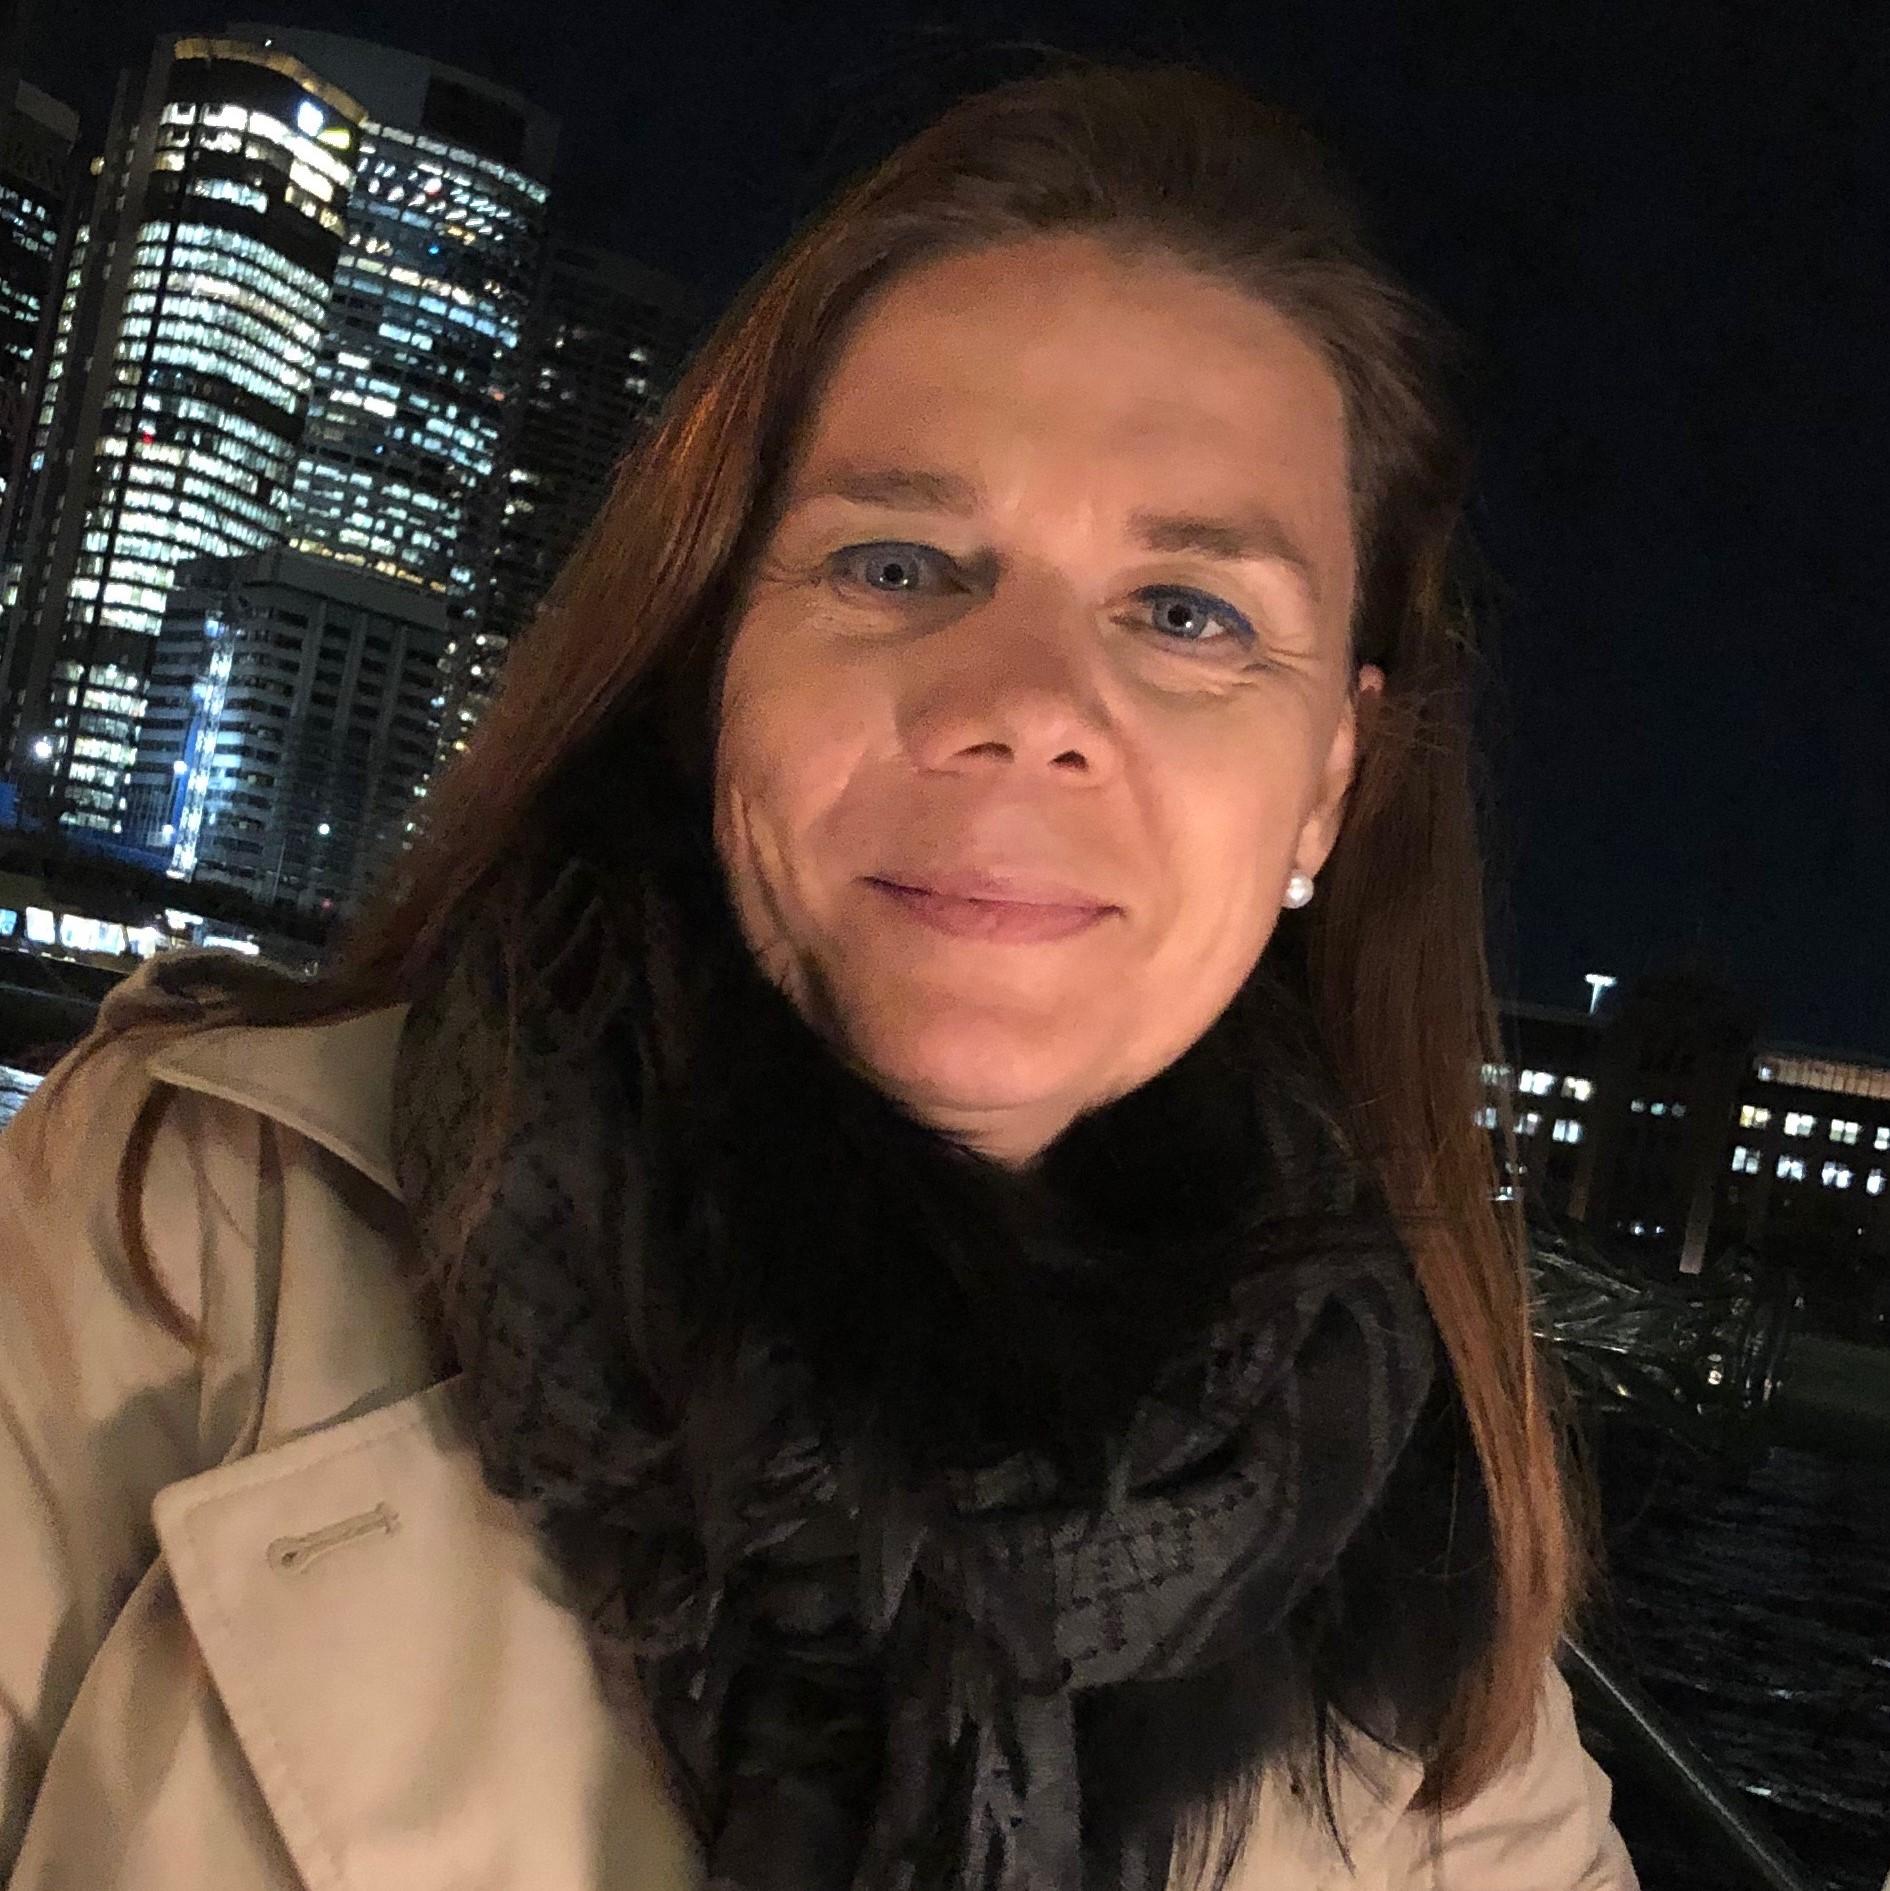 Profile picture of Veronique Hoste